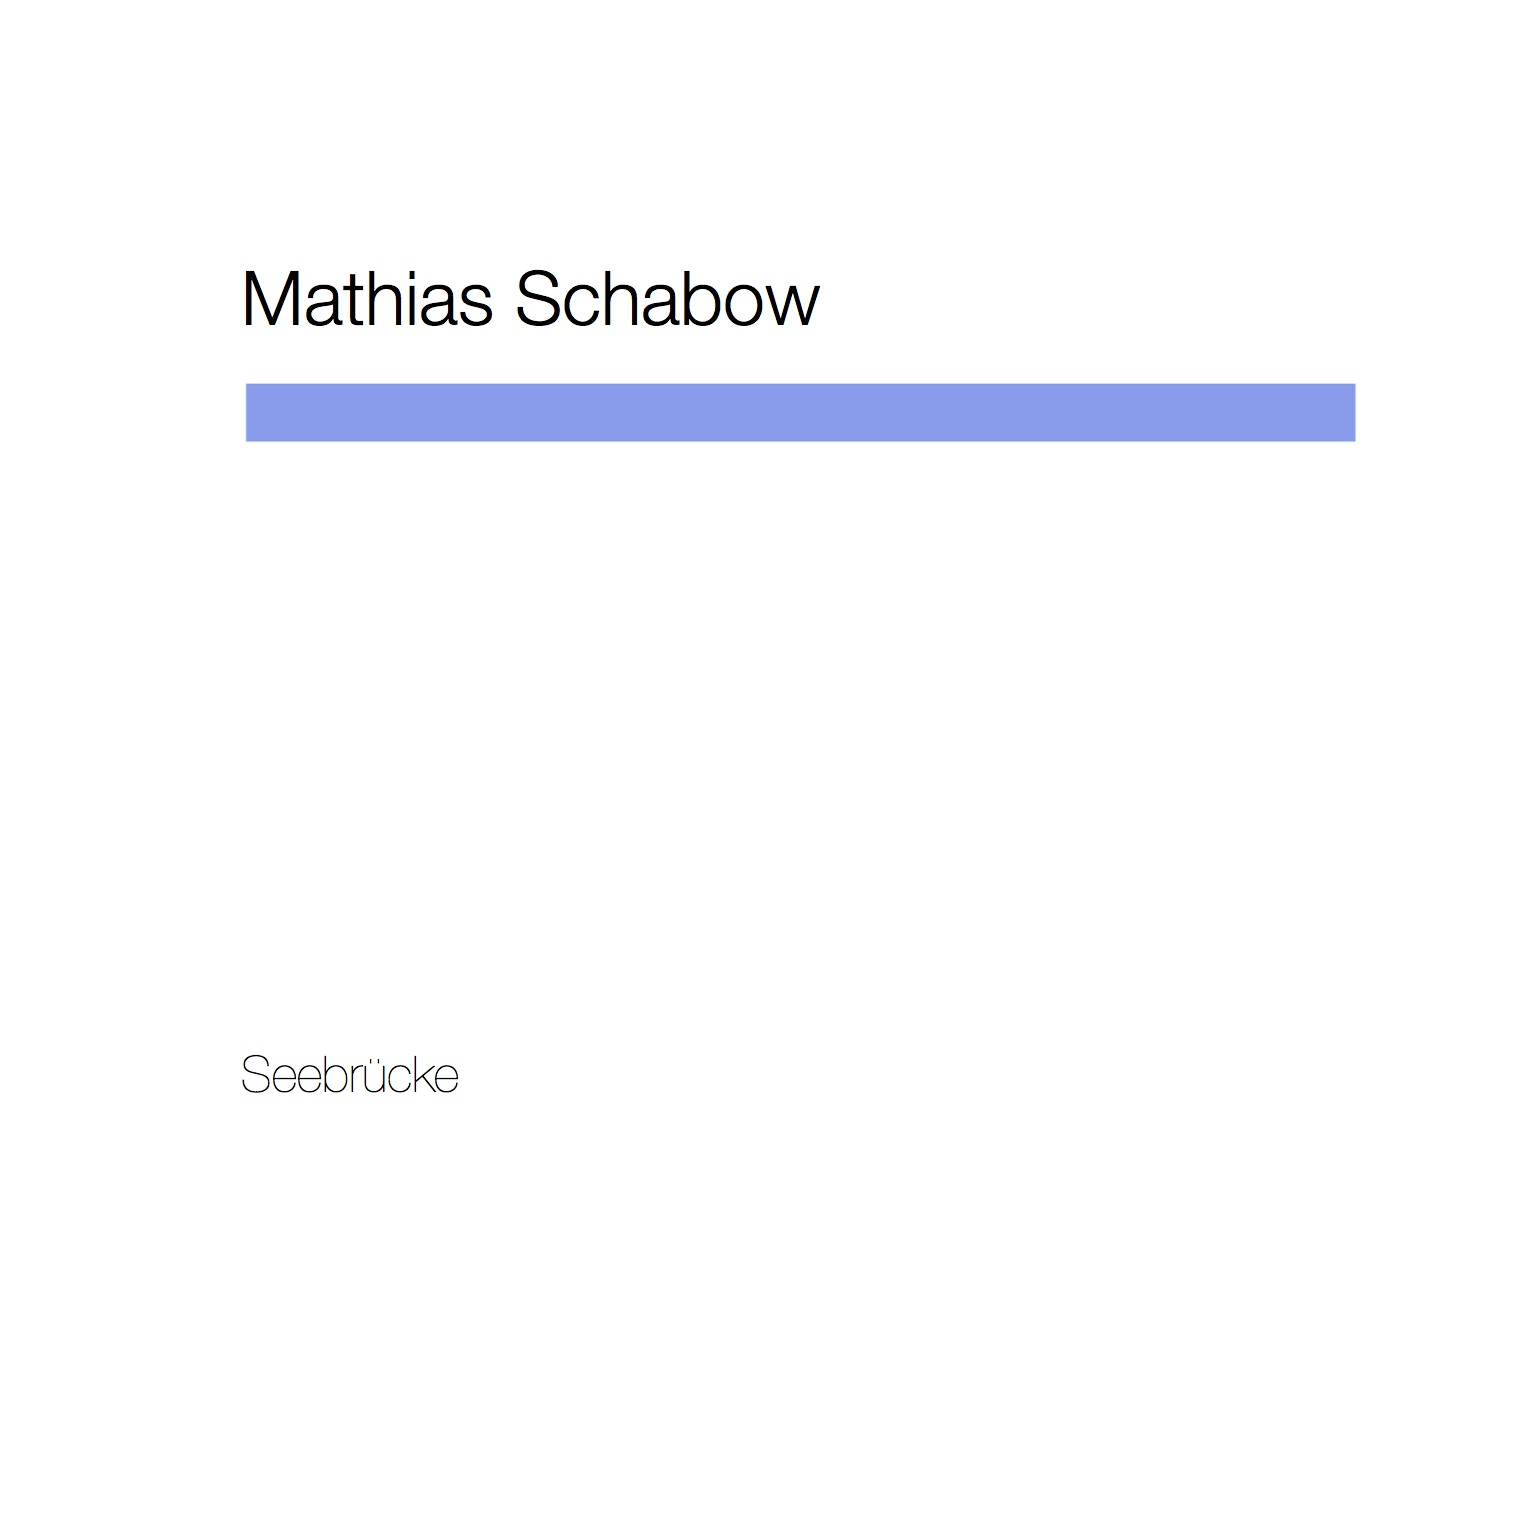 Seebrücke - Mathias Schabow | Piano